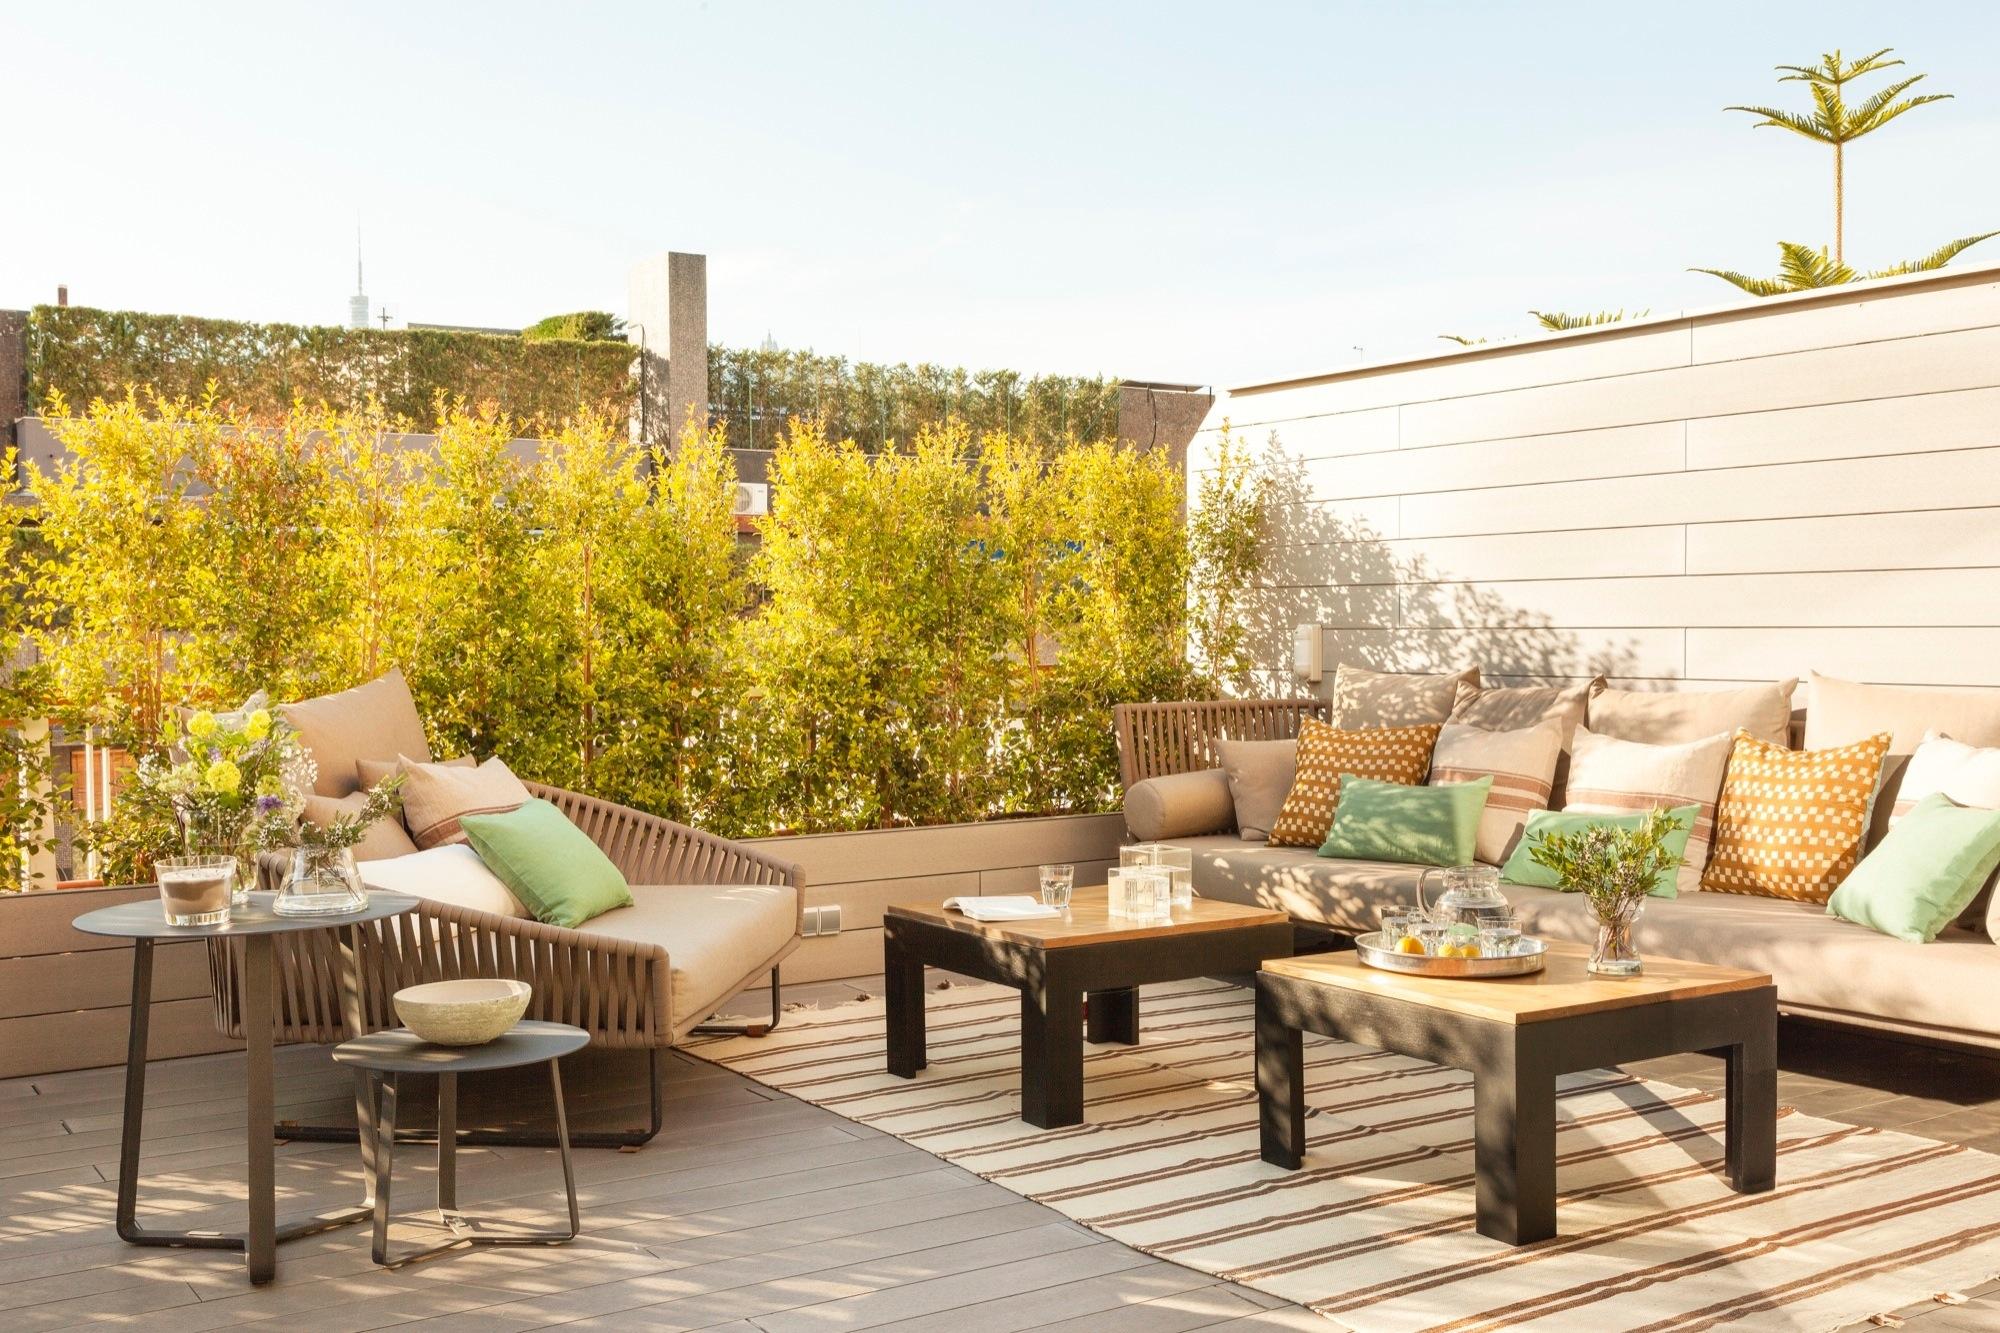 La terraza perfecta que conquist a los due os for Mesa exterior terraza